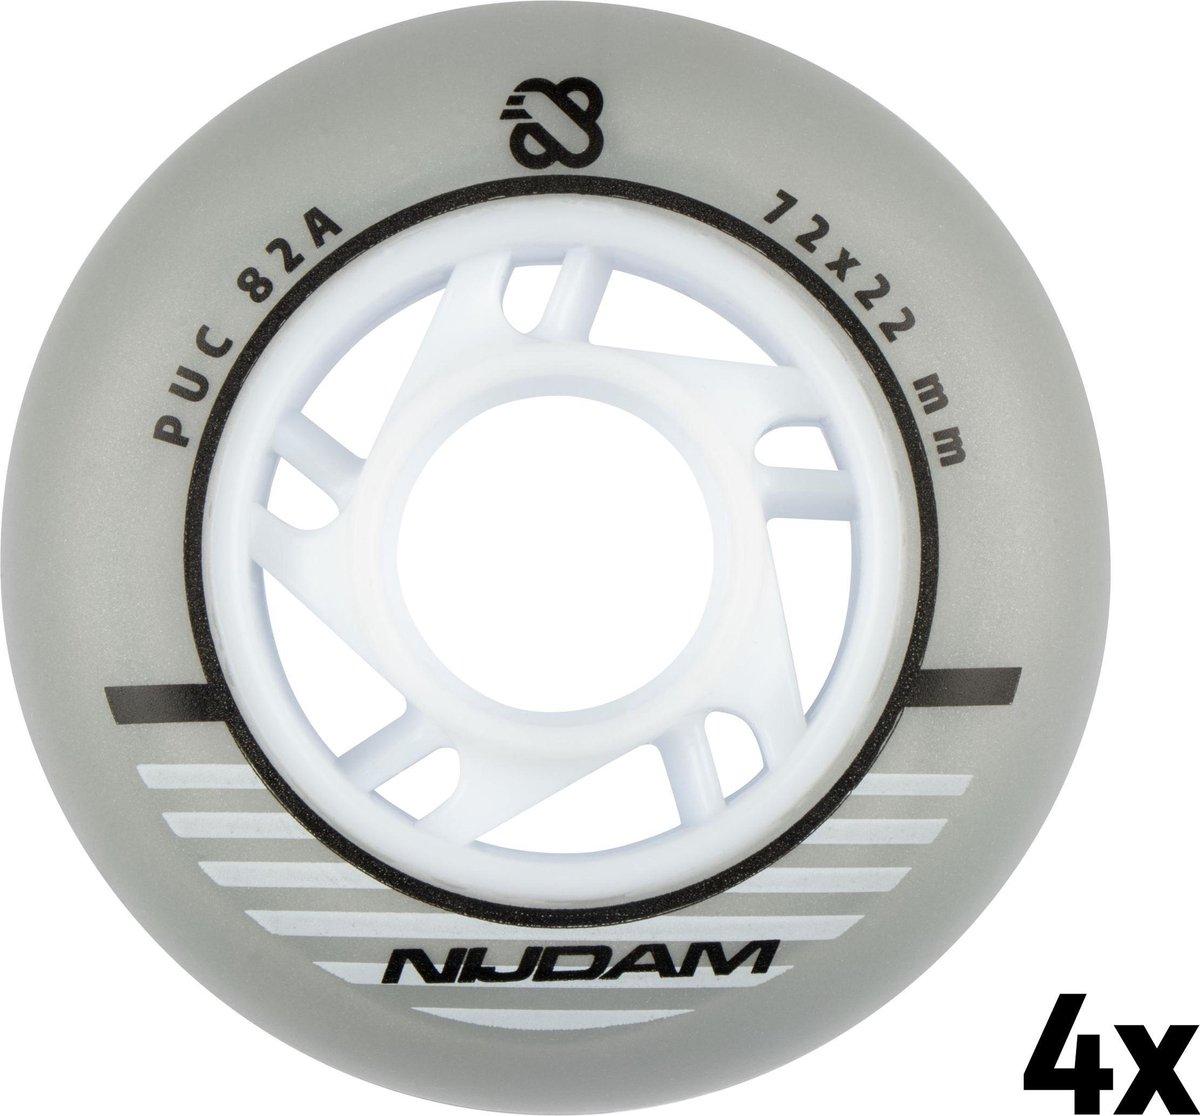 Nijdam Inline Skate Wielen Set - 72x22 mm - 4st - Silver - Zilver/Wit/Zwart